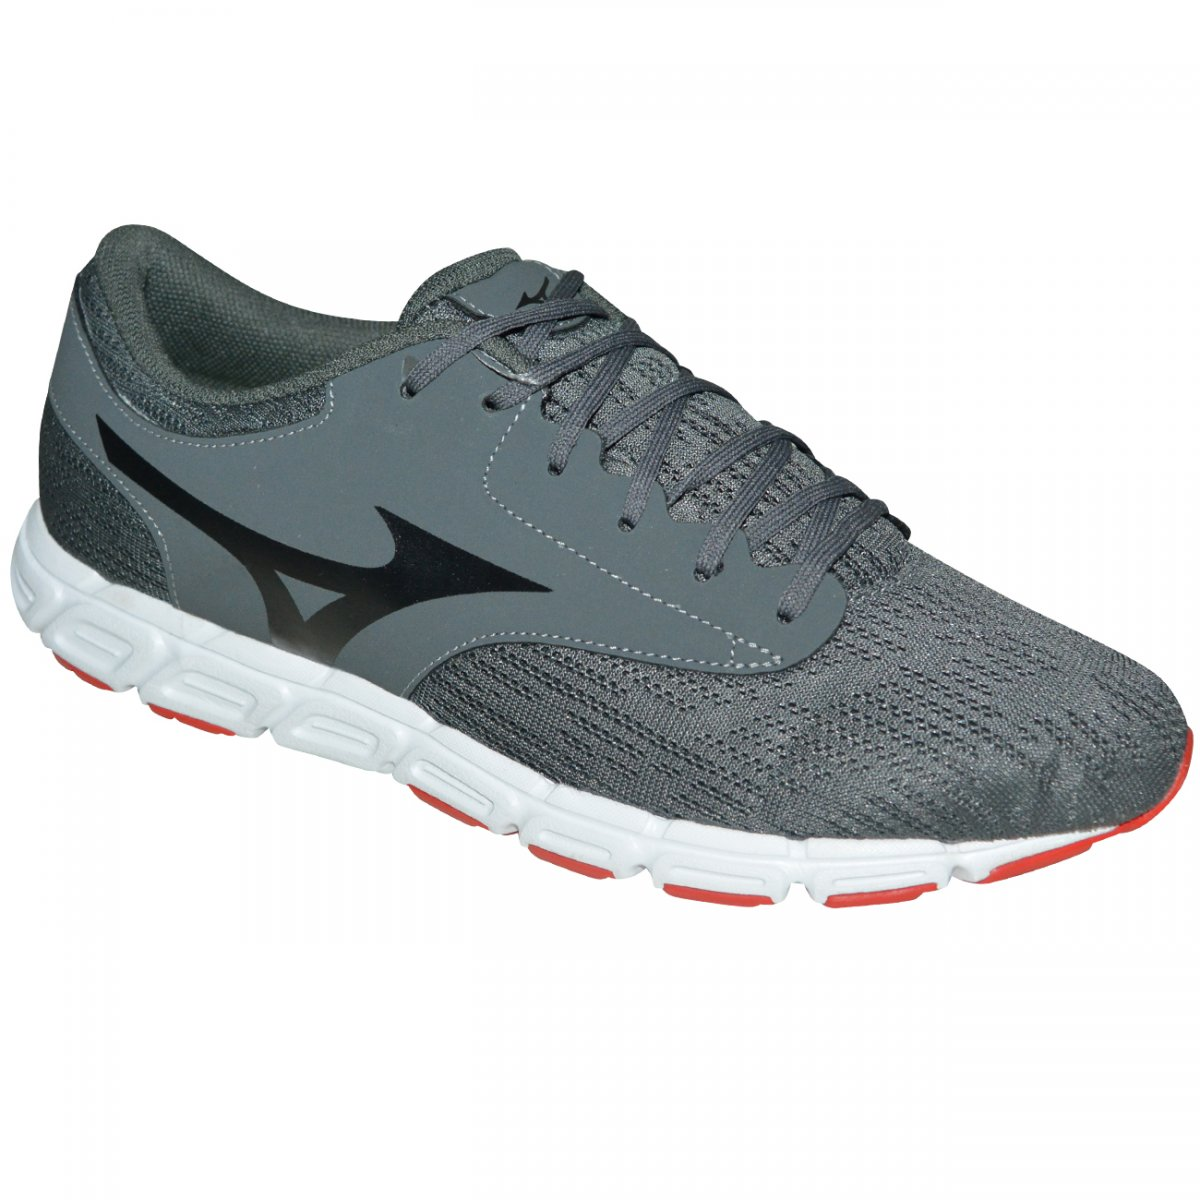 Tenis Mizuno EZ Flex P 4141112 - 0443 - Grafite vermelho - Chuteira Nike 3f3db2211701c